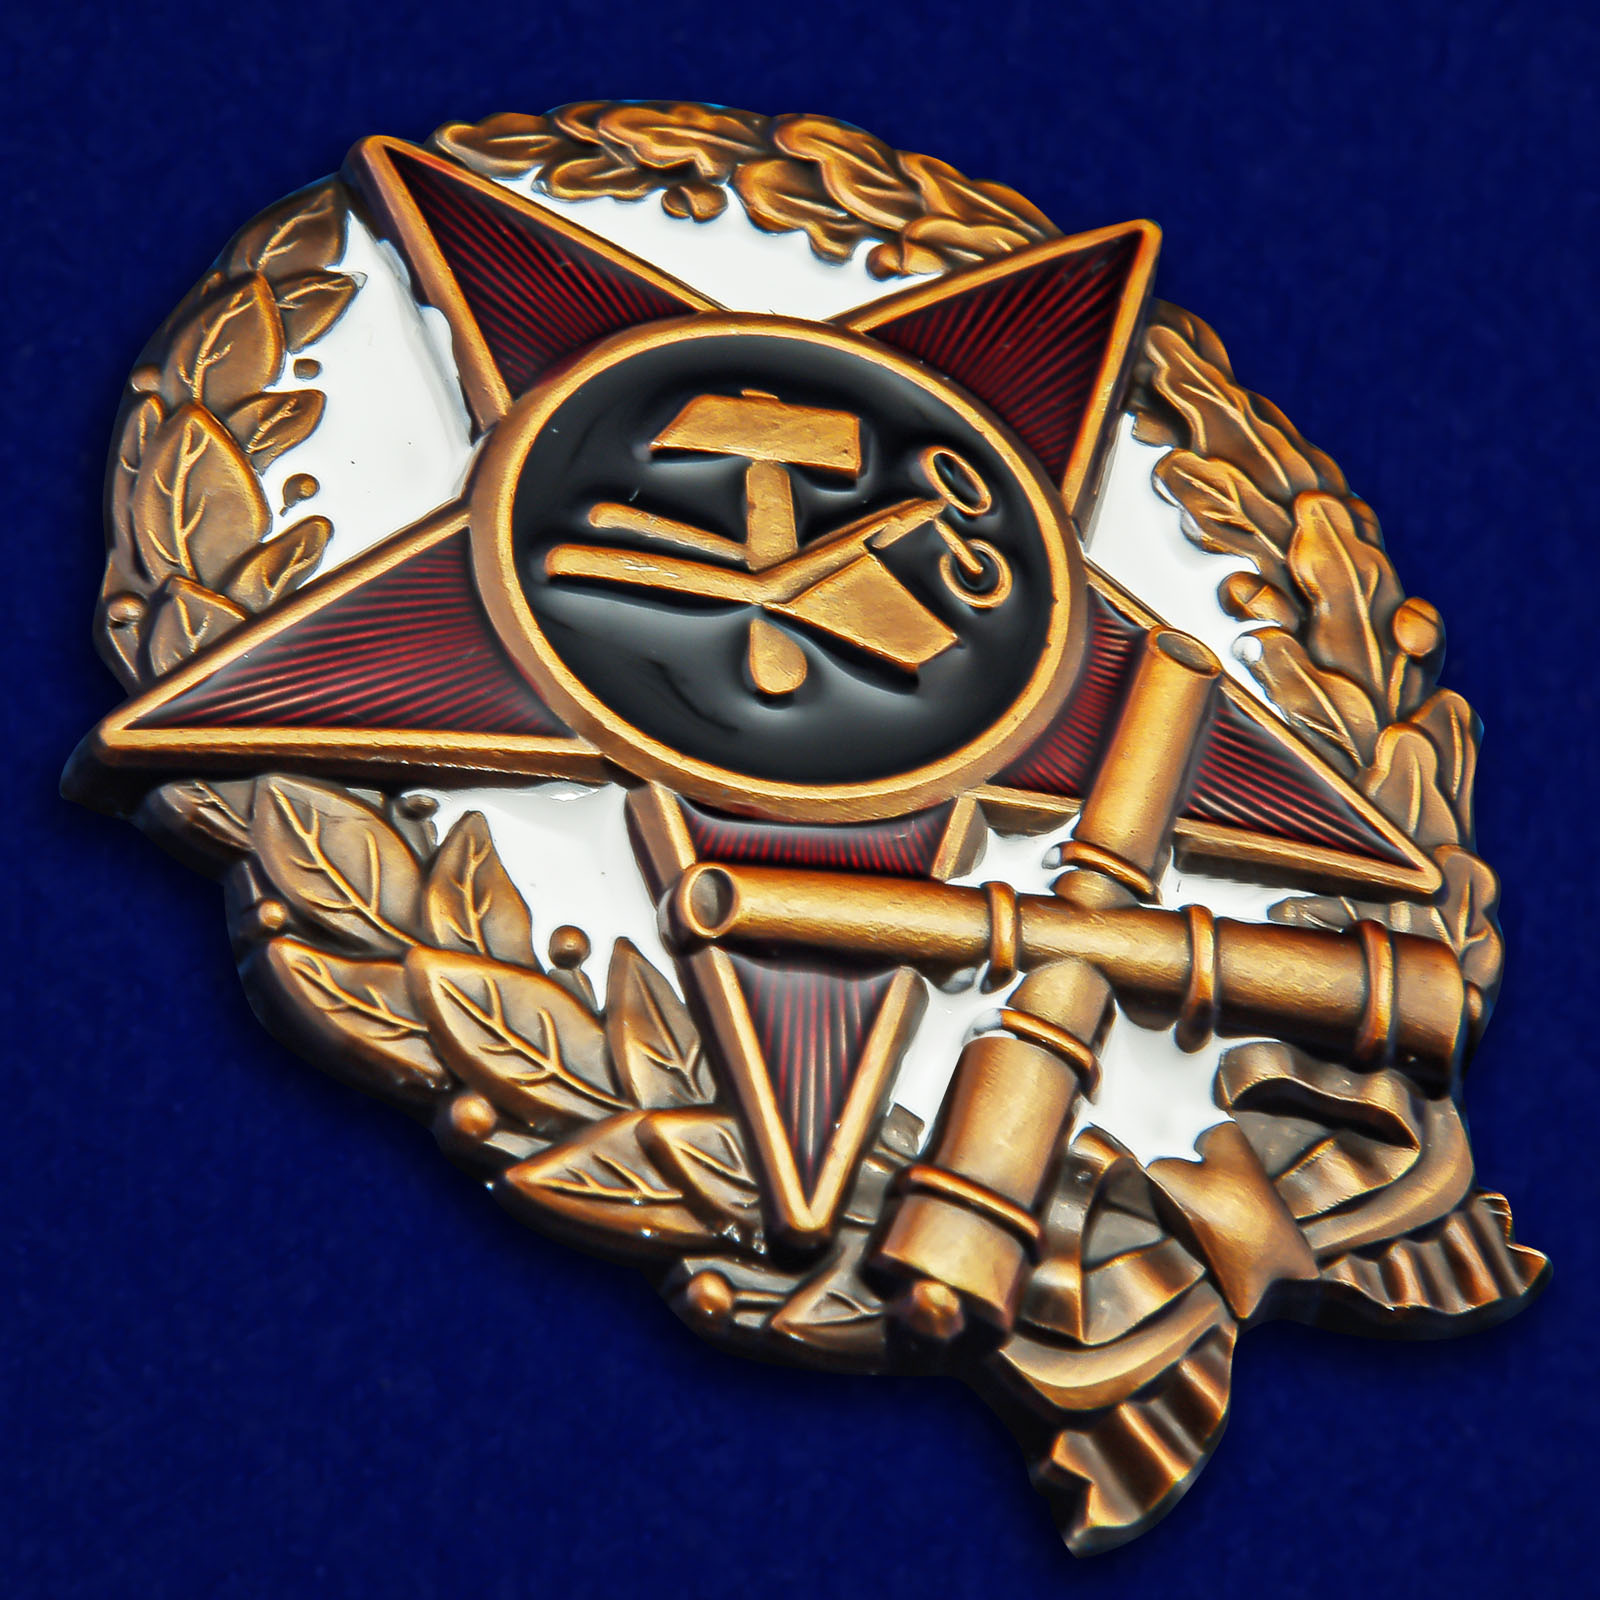 Нагрудный знак Командир-артиллерист - общий вид